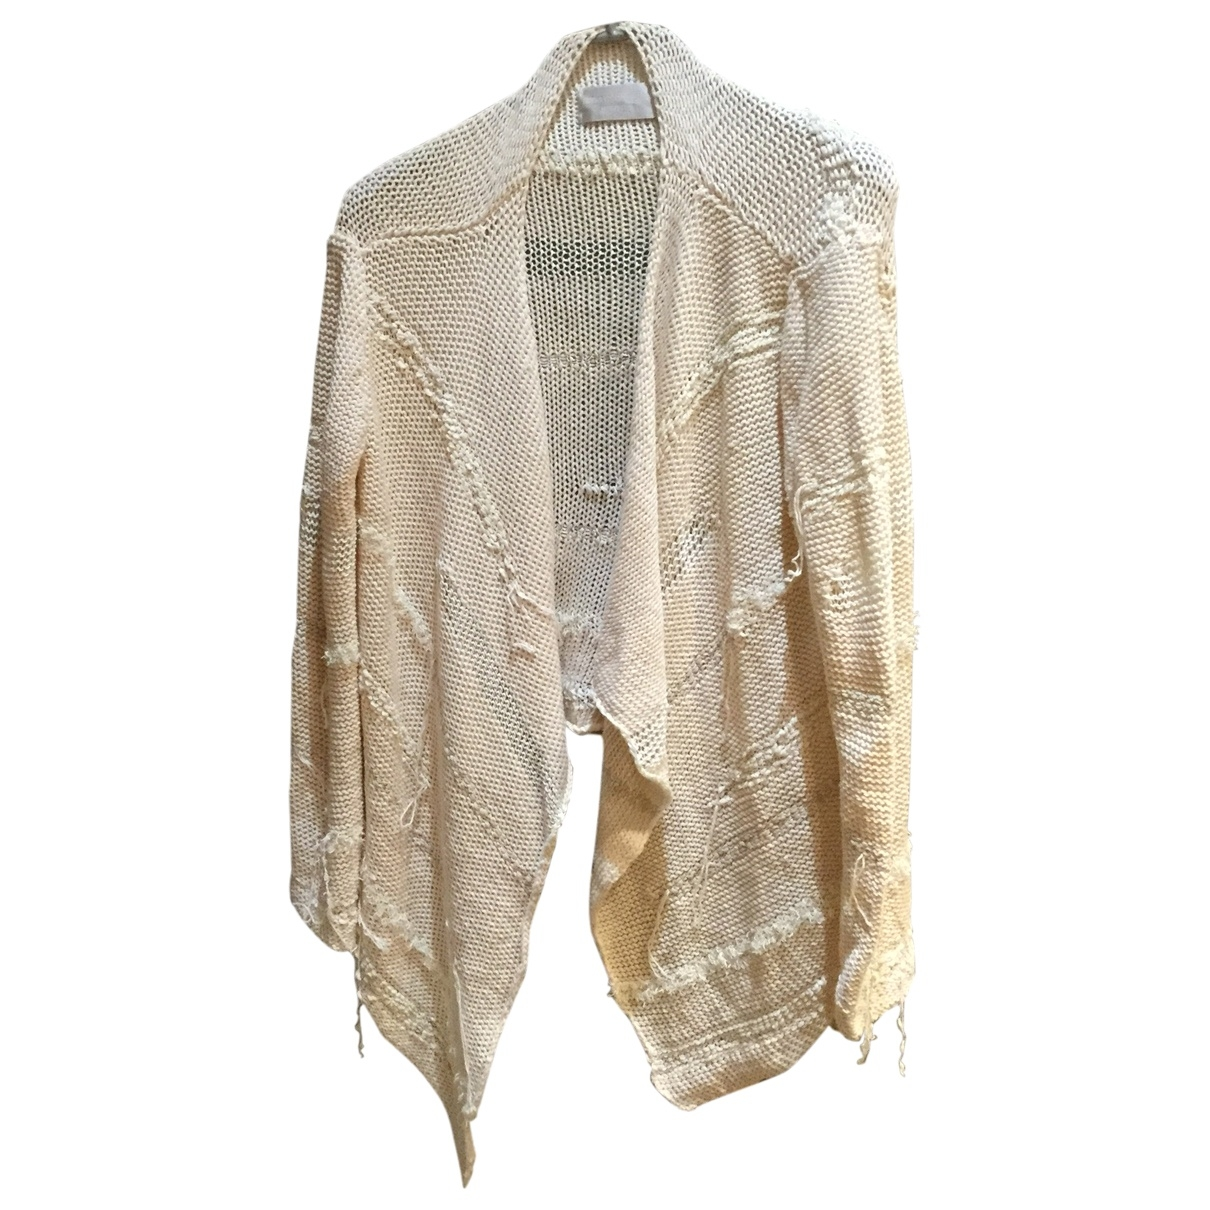 Zadig & Voltaire \N Cotton Knitwear for Women M International